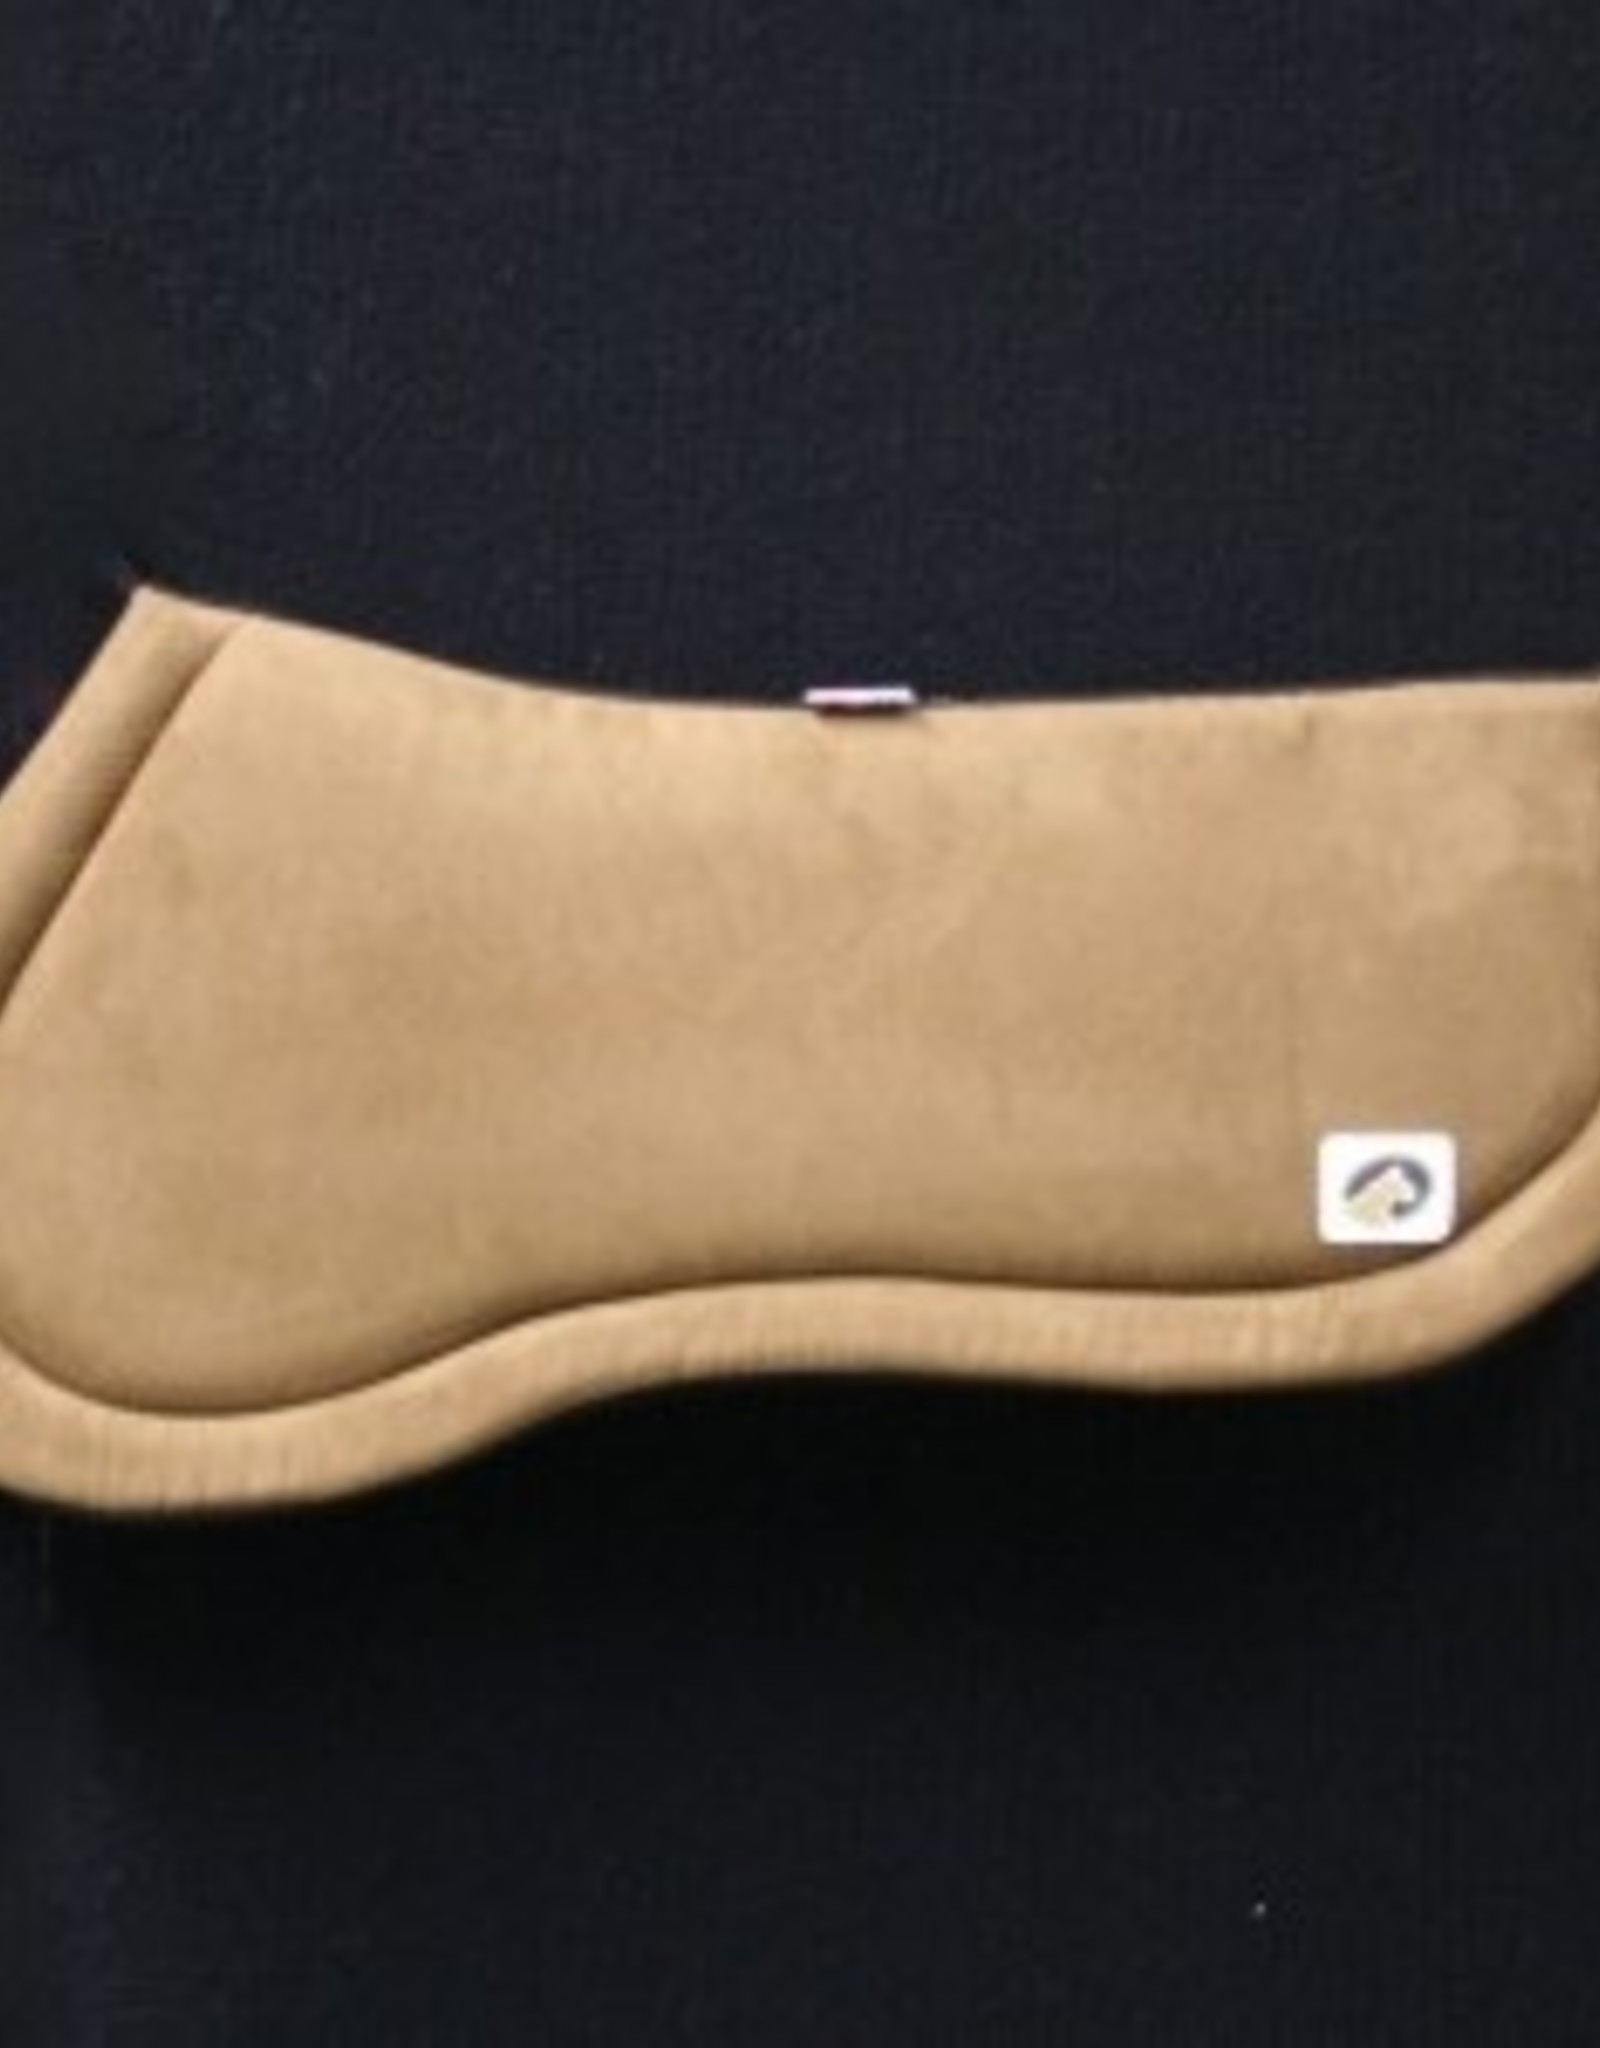 Ecogold Memory Foam Triple Protection Jumper Half Pad